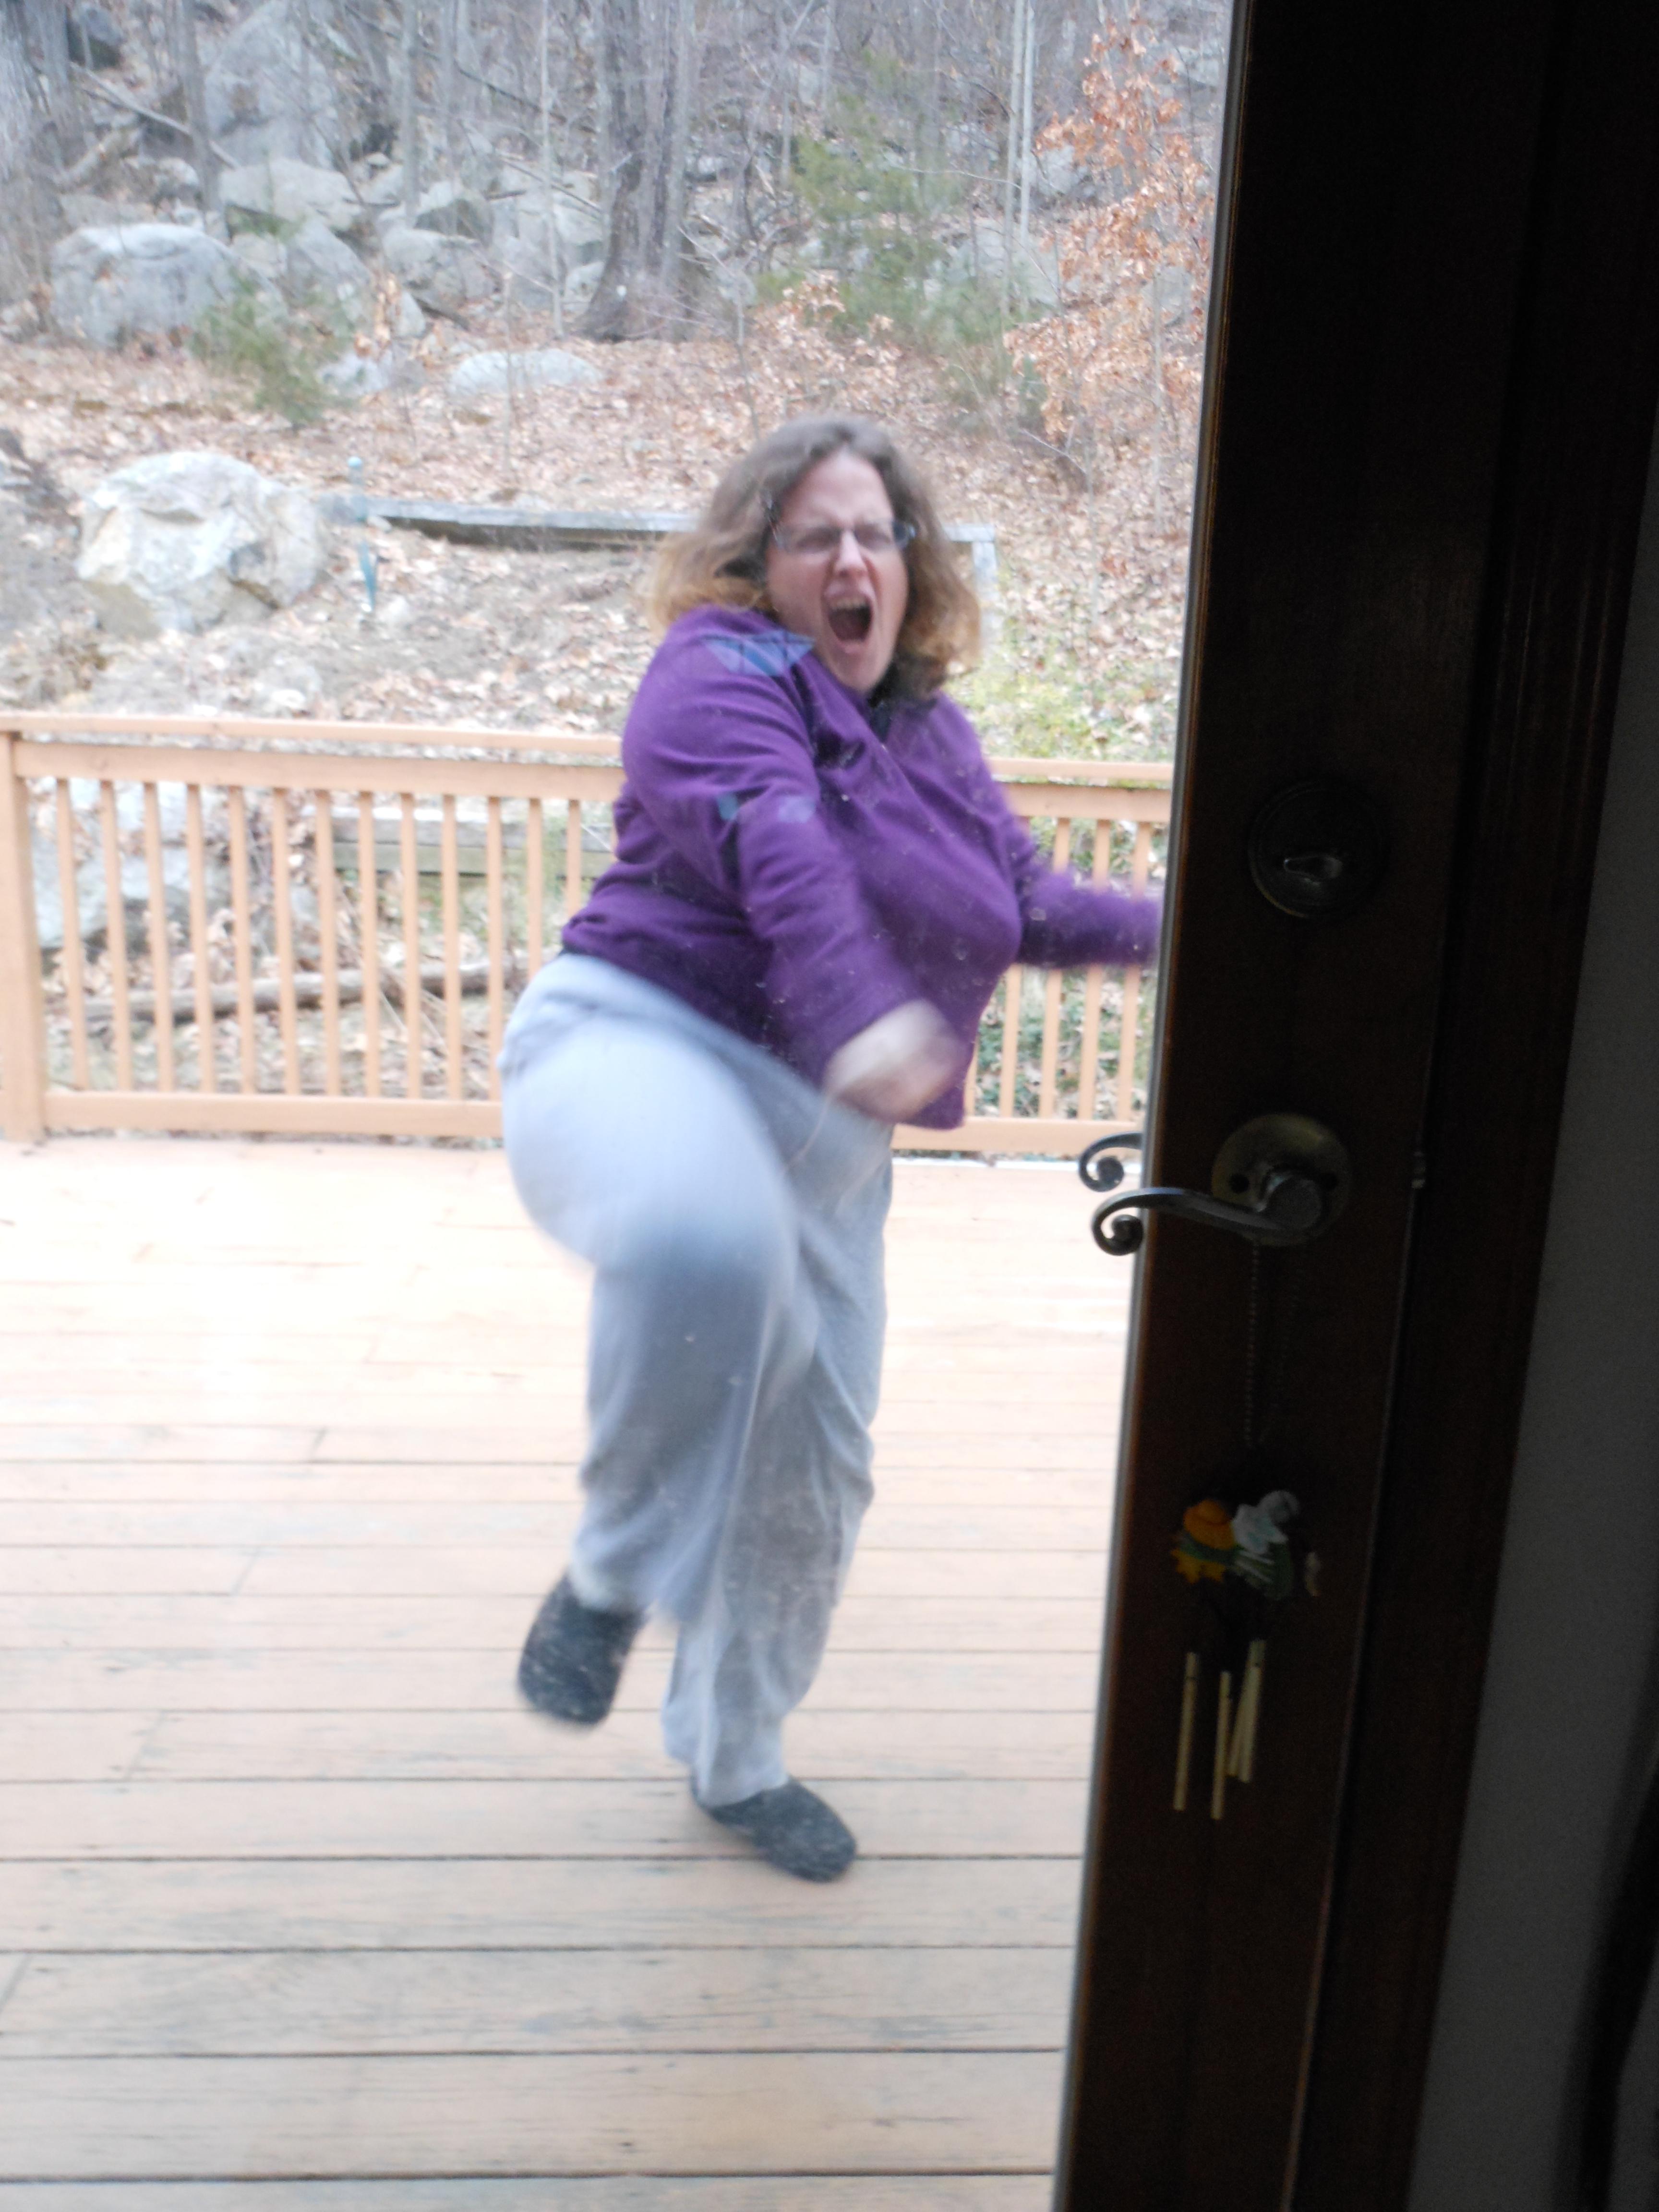 Kick down a door! lol  sc 1 st  Pinterest & Kick down a door! lol | My Bucket List...:) | Pinterest | Buckets pezcame.com